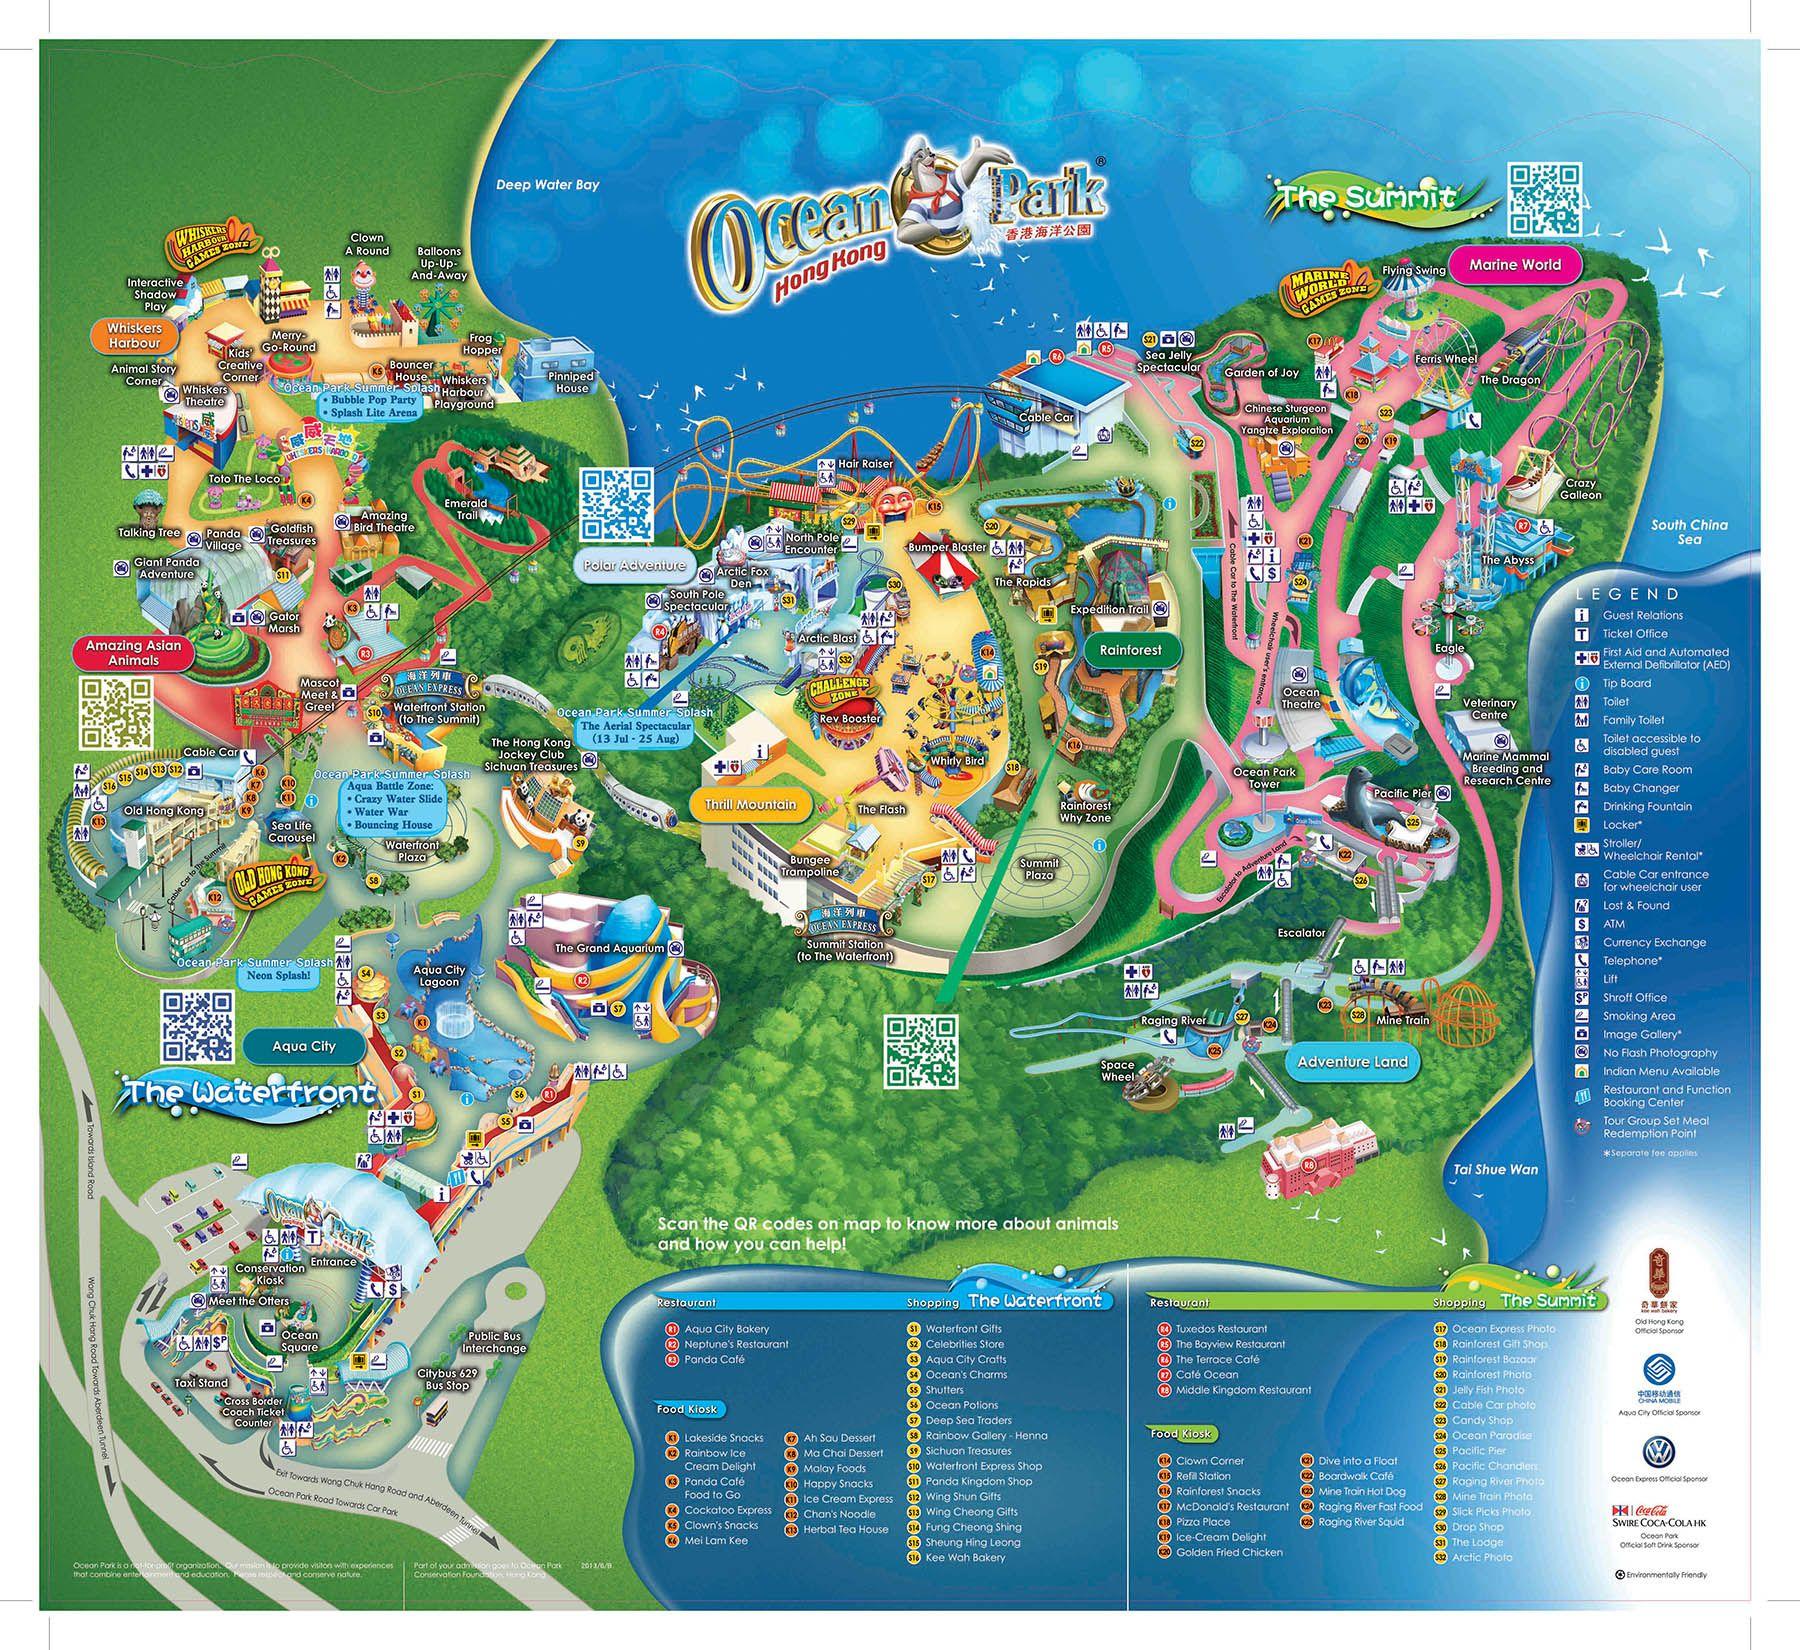 Ocean park mapg 18001650 hk voyages pinterest ocean park mapg 18001650 gumiabroncs Image collections